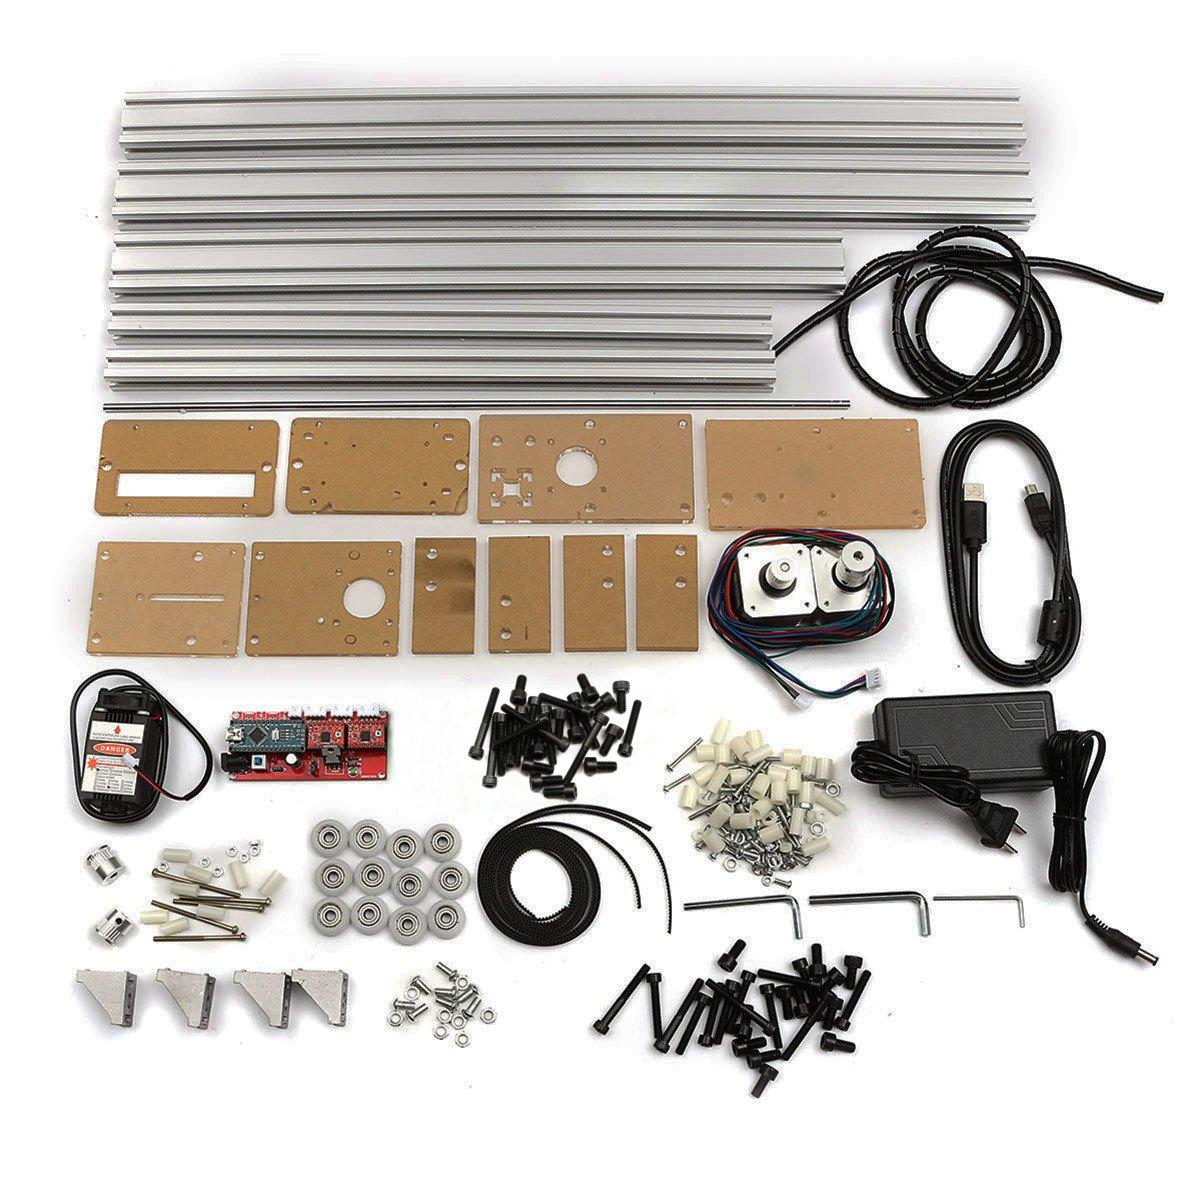 40X50CM 500mW DIY Desktop Mini Blue Laser Engraving Engraver Machine Wood Router/Cutter/Printer/Power Adjustable Laser